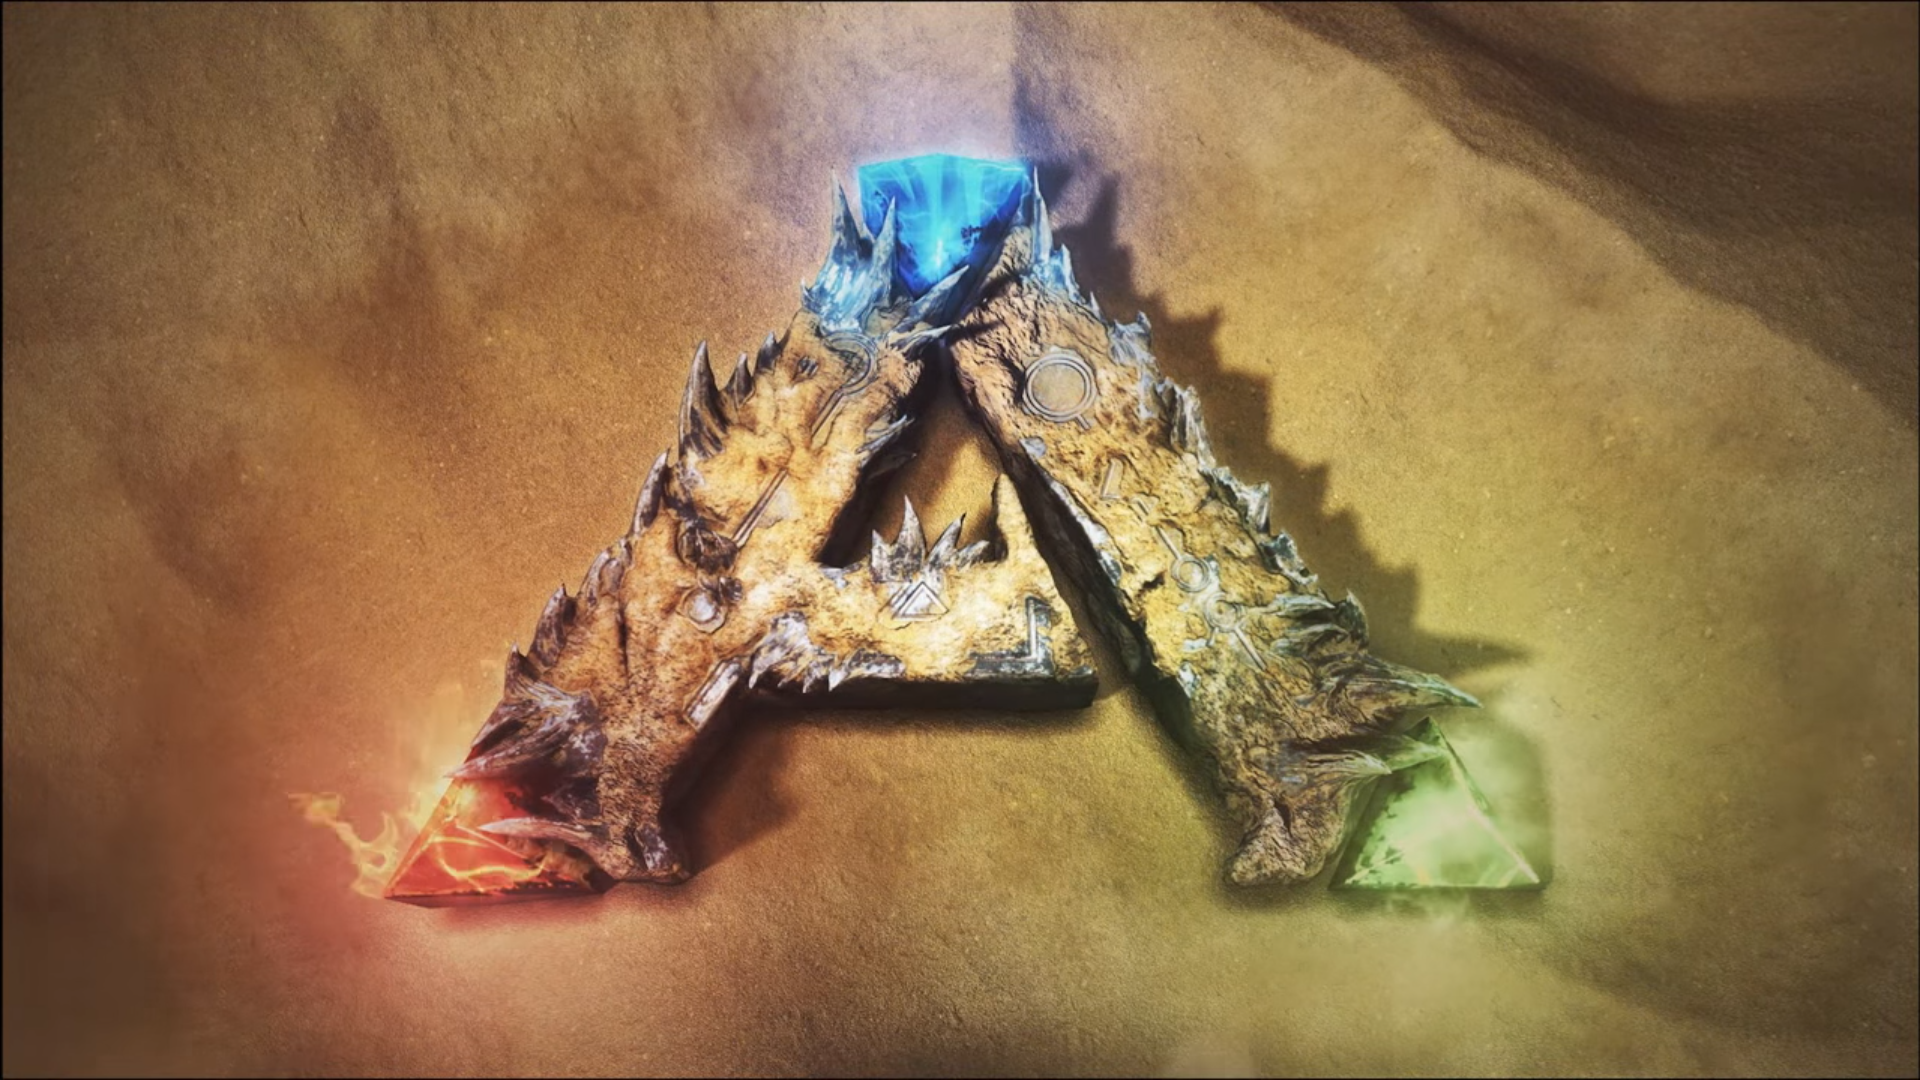 Image Result For Ark Survival Evolved Logo Ark Survival Evolved Evolve Wallpapers Survival